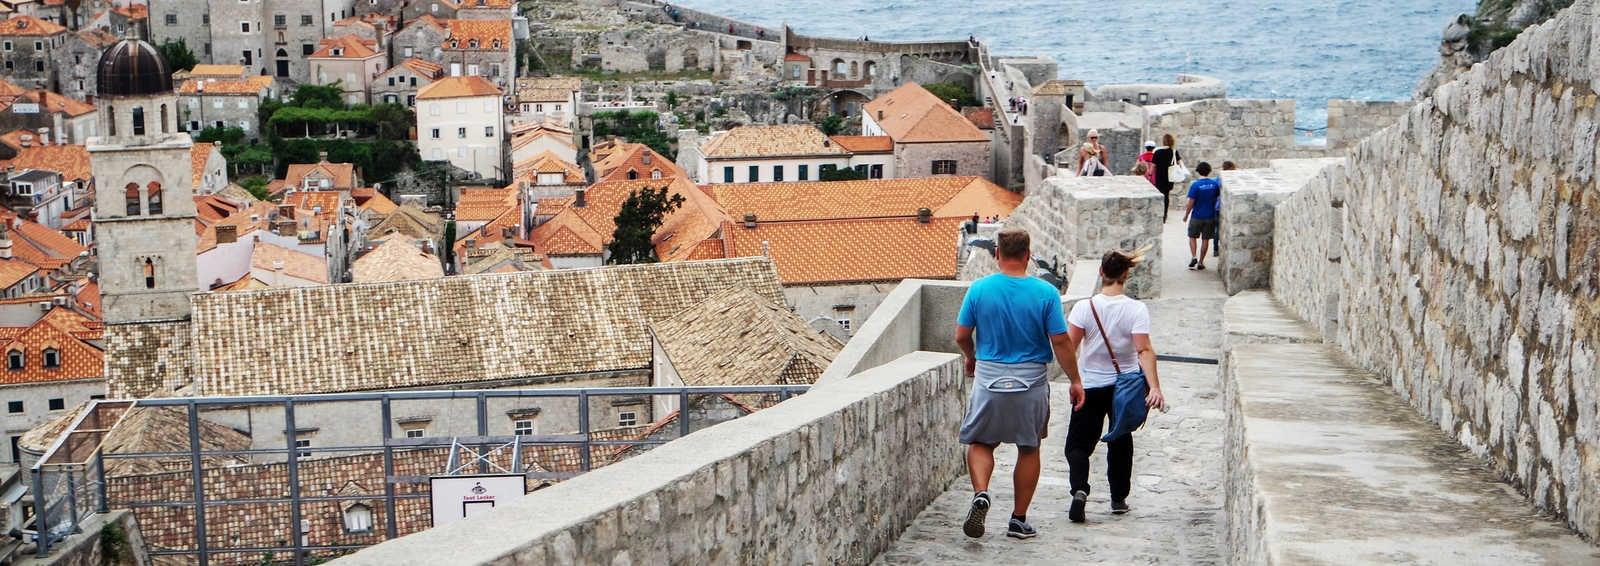 Walking the walls in Dubrovnik